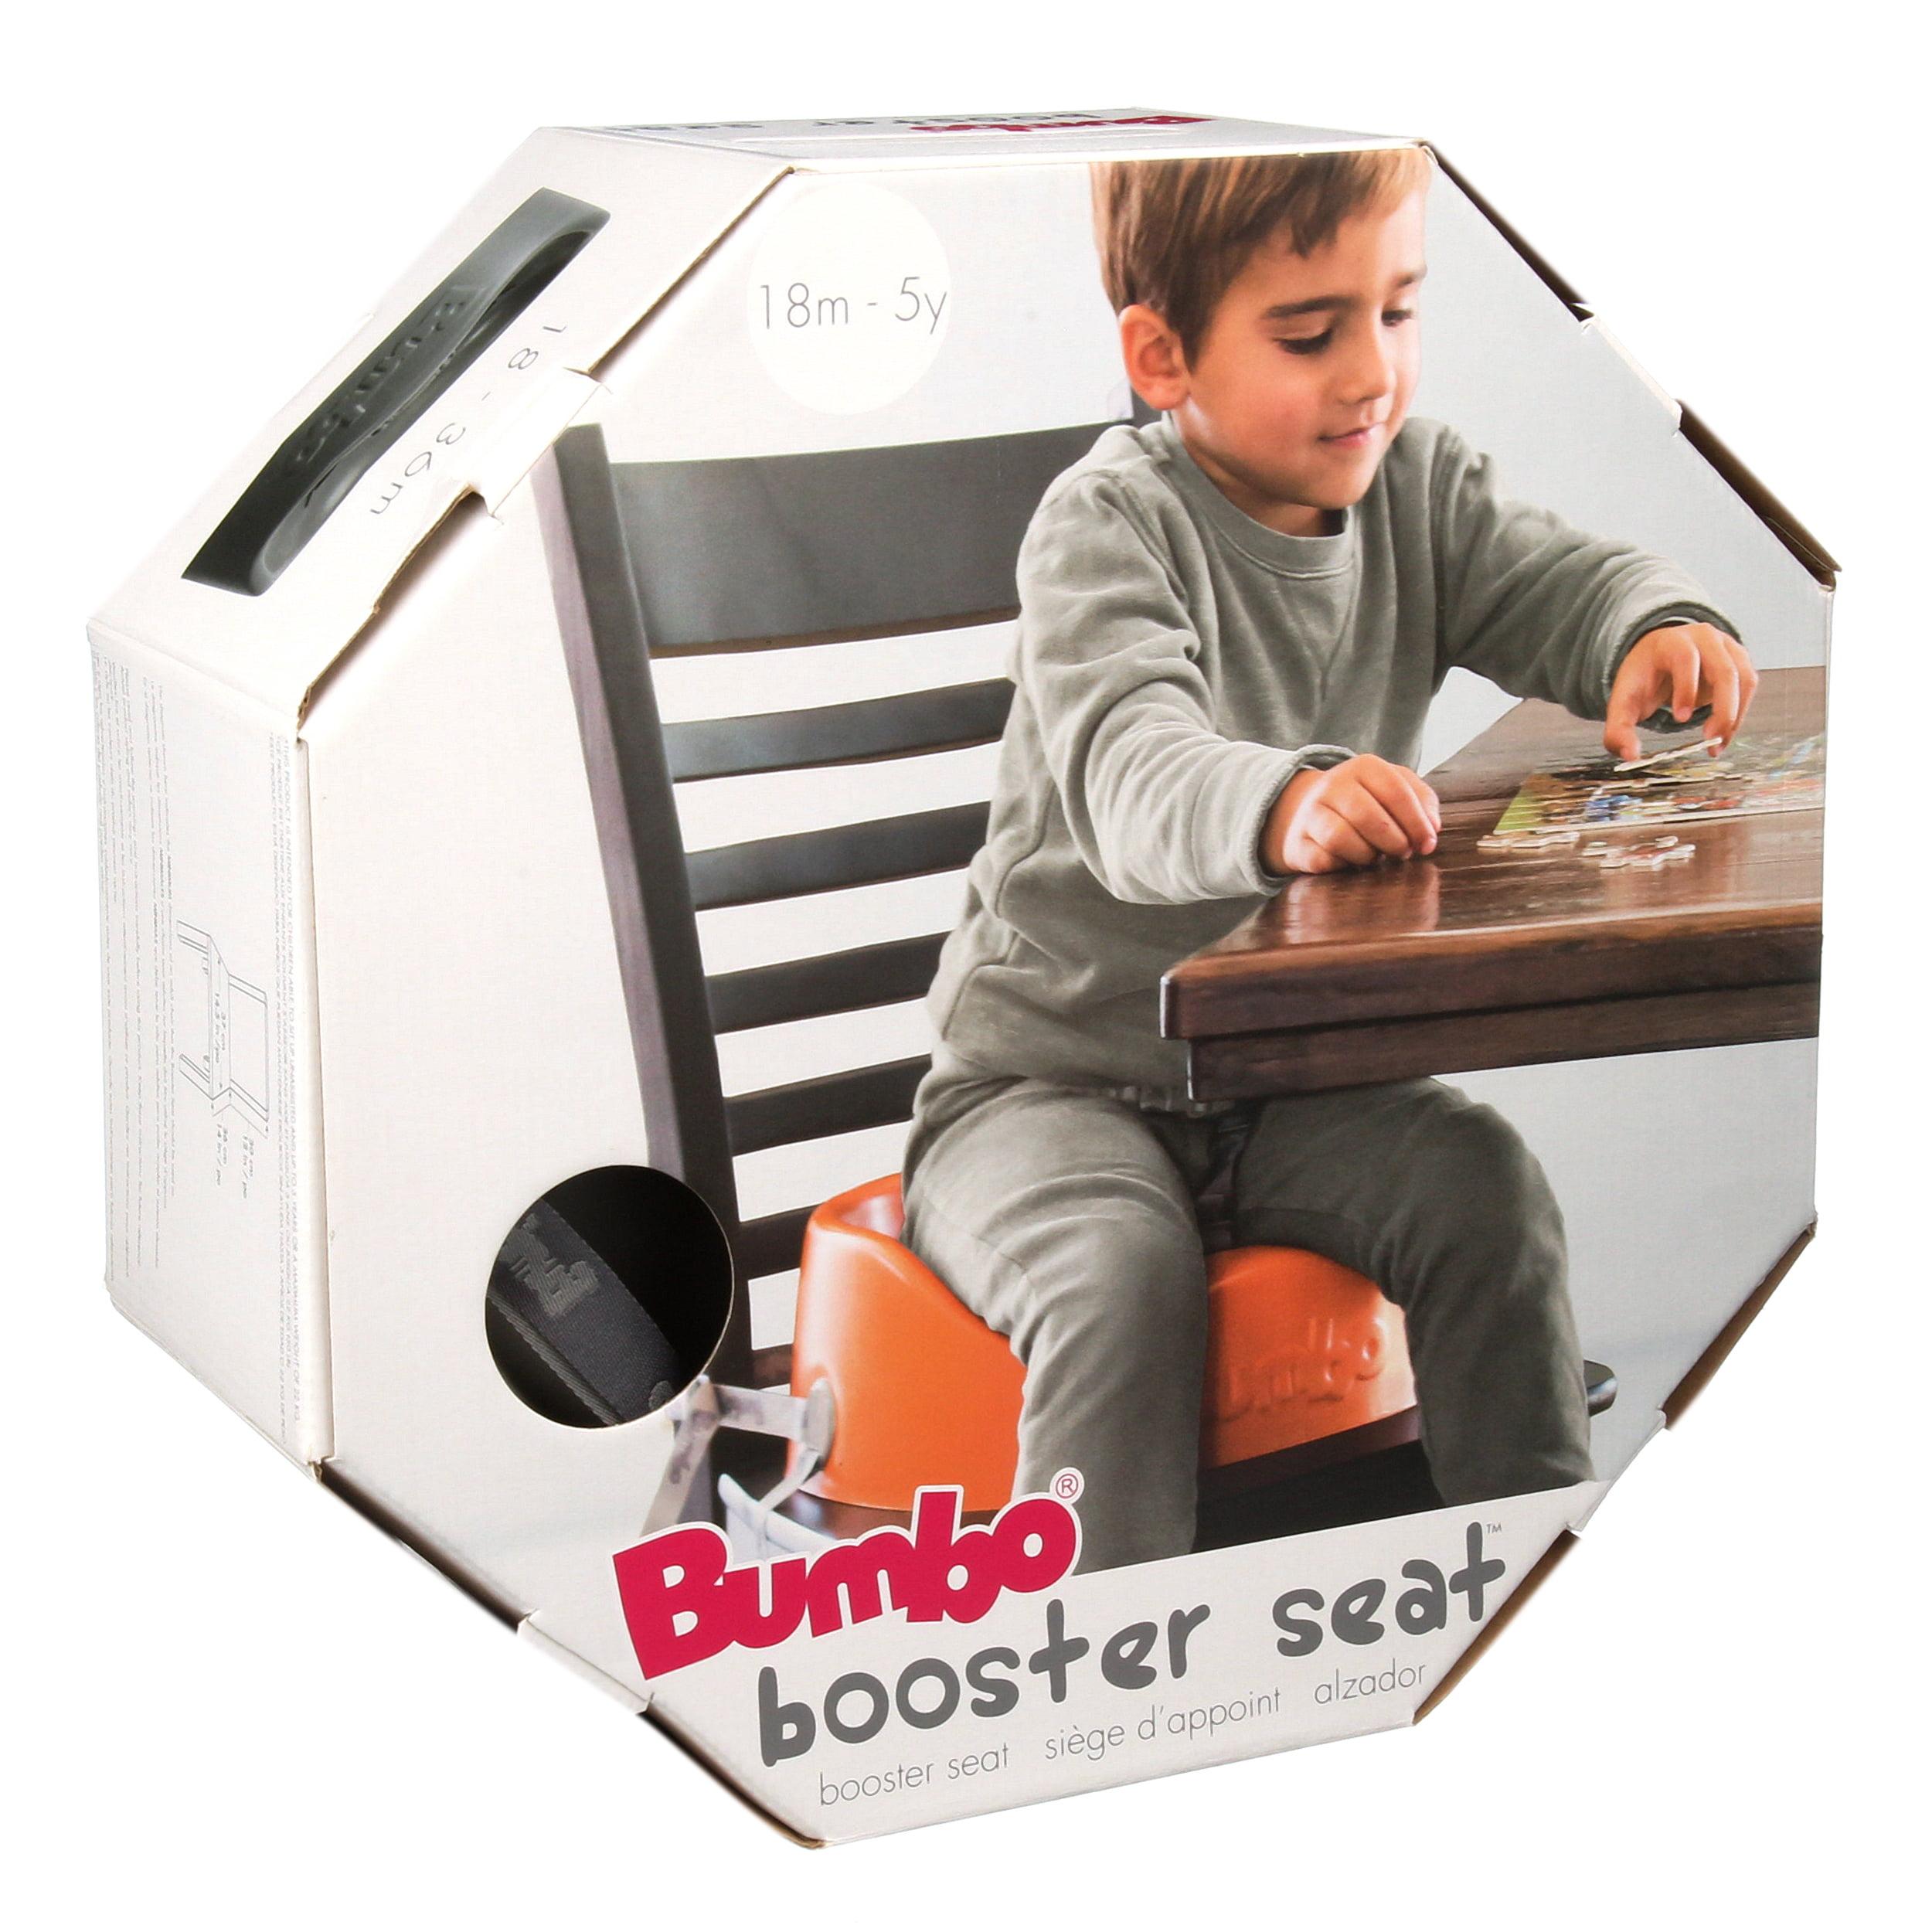 Bumbo Booster Seat, Cool Grey - Walmart.com - Walmart.com